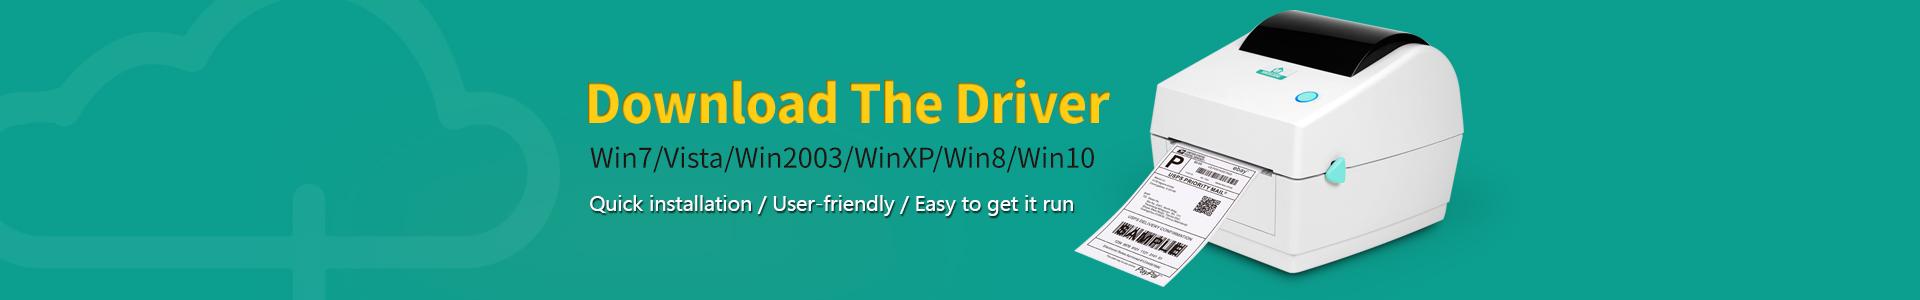 qr-driver-download-banner-.jpg